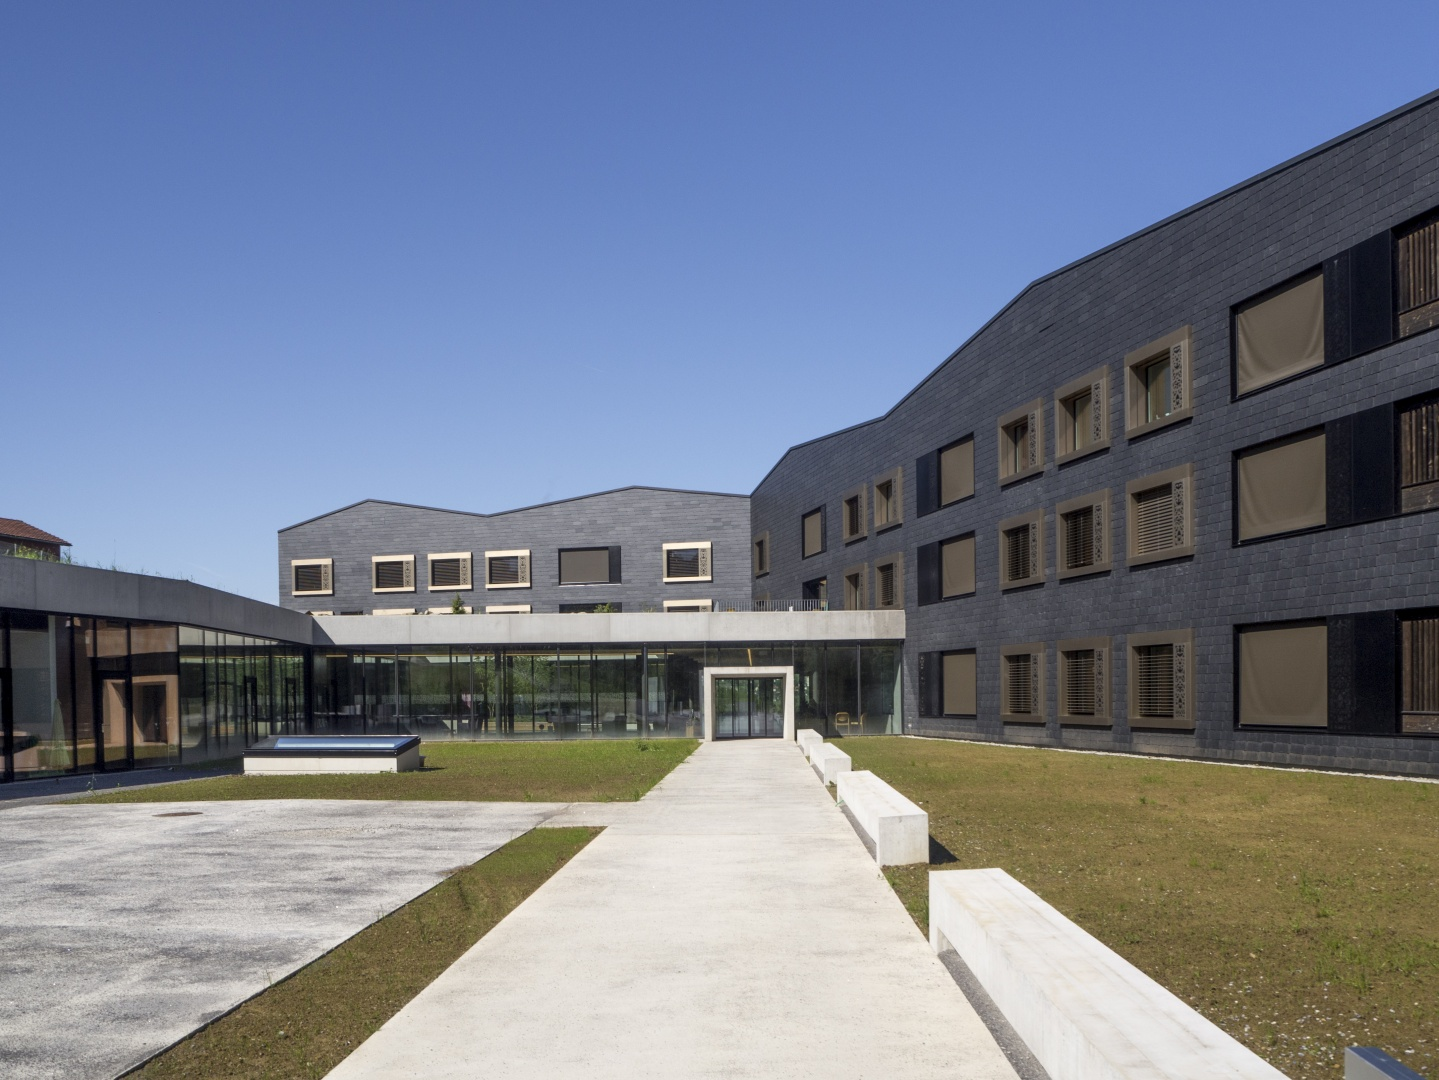 neubau wohnheim sonne rehetobel ar arc award. Black Bedroom Furniture Sets. Home Design Ideas